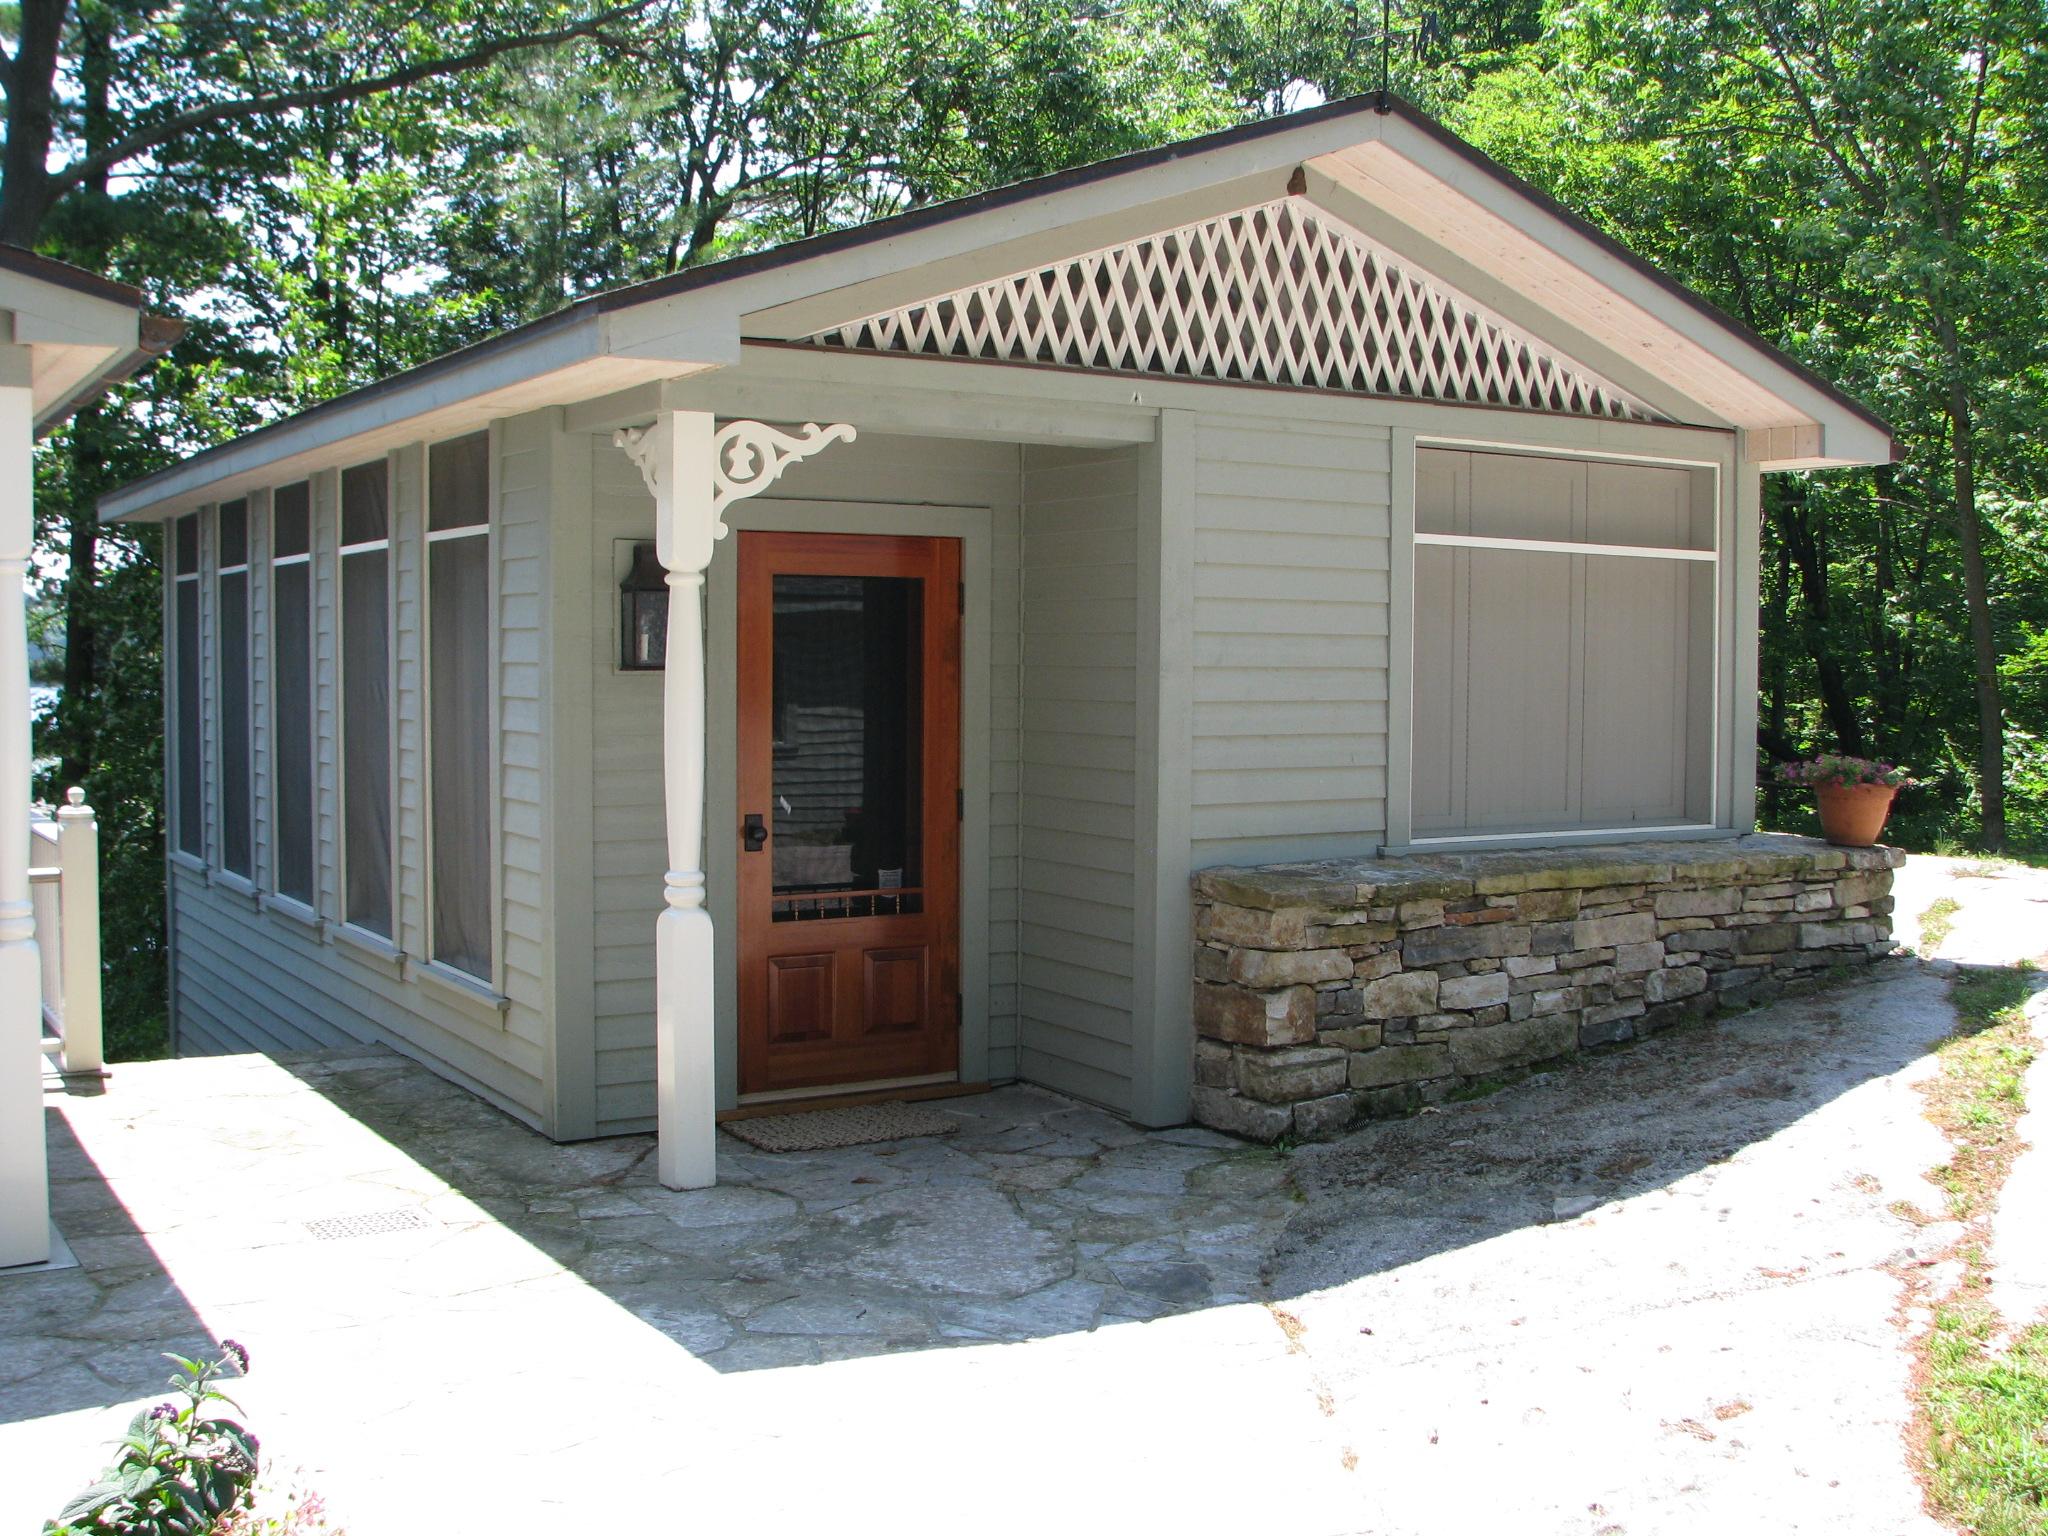 Thousand Islands Cottage | Landscape Architecture | Brockville | Riverview Design Solutions | Prescott, Ontario, Canada